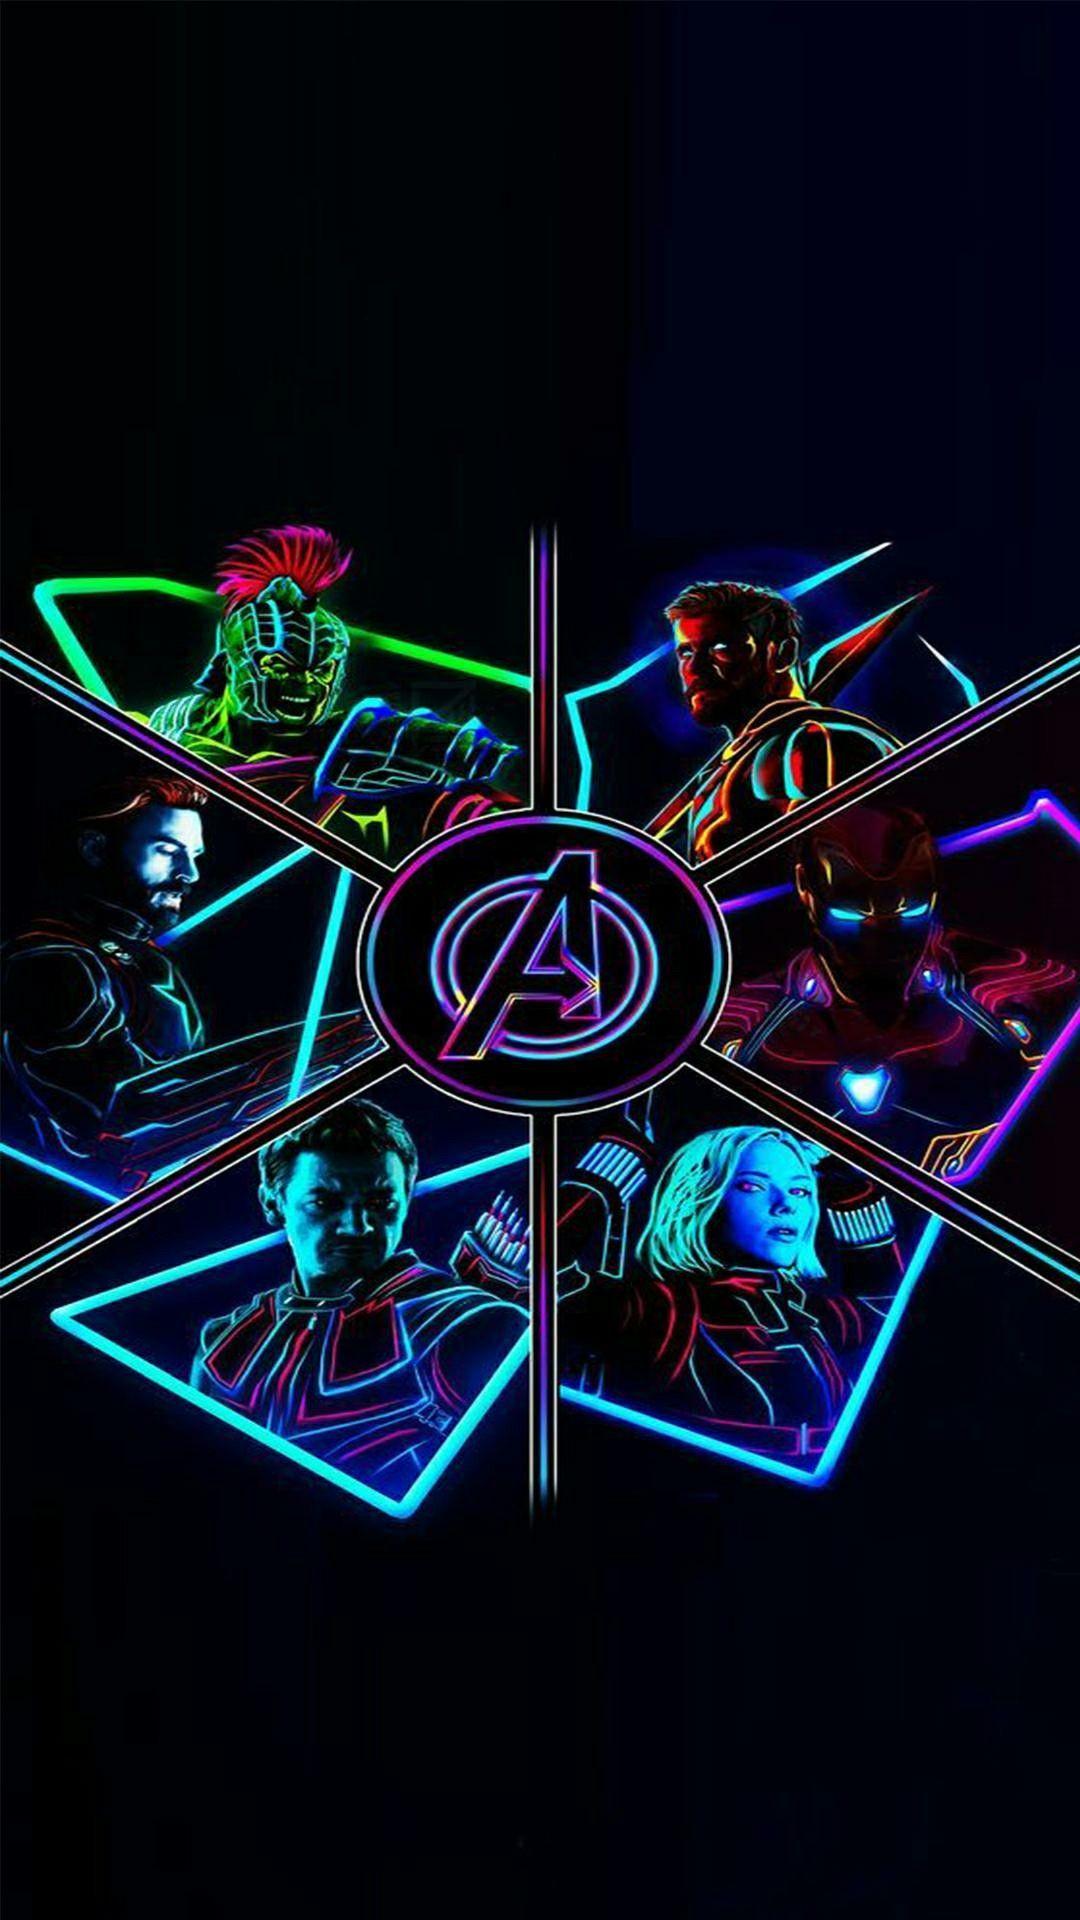 Epingle Par Minha Sur Super Heroes Super Villains Fond D Ecran Avengers Fond D Ecran Marvel Heros Marvel